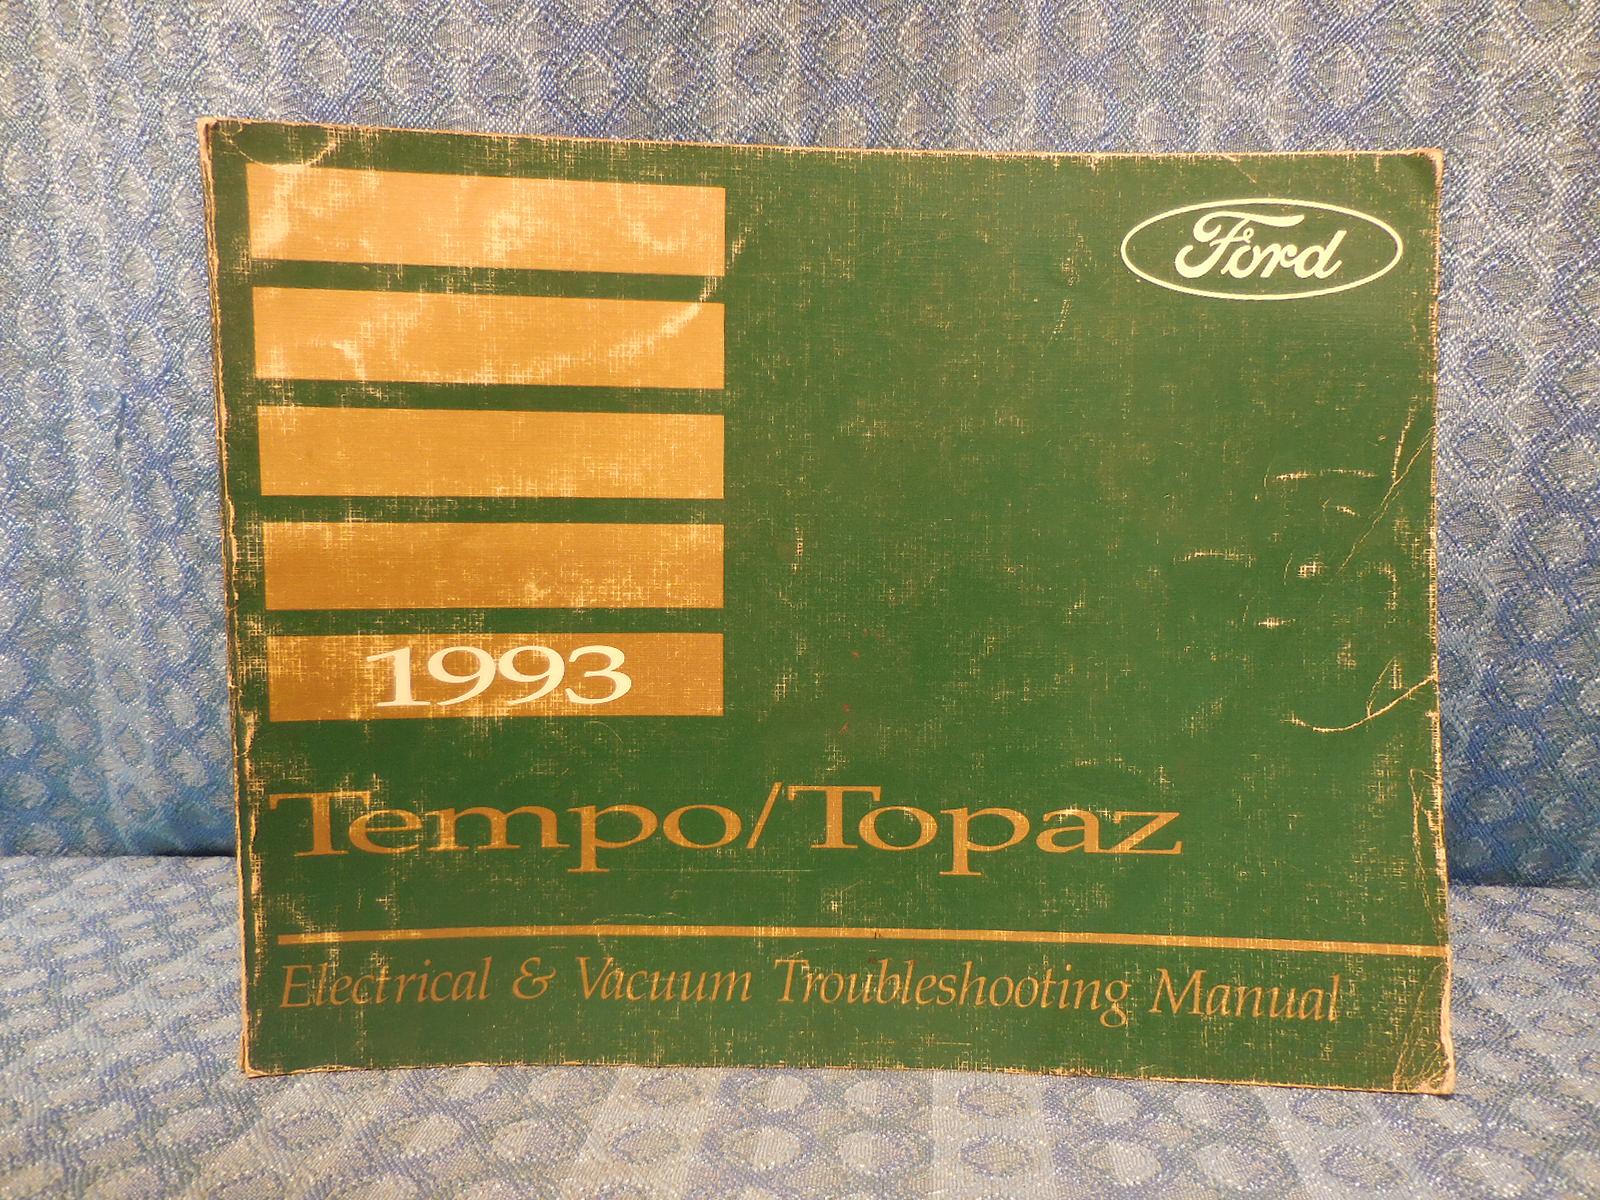 1993 ford tempo mercury topaz oem electrical \u0026 vacuum1993 ford tempo mercury topaz oem electrical \u0026 vacuum troubleshooting manual